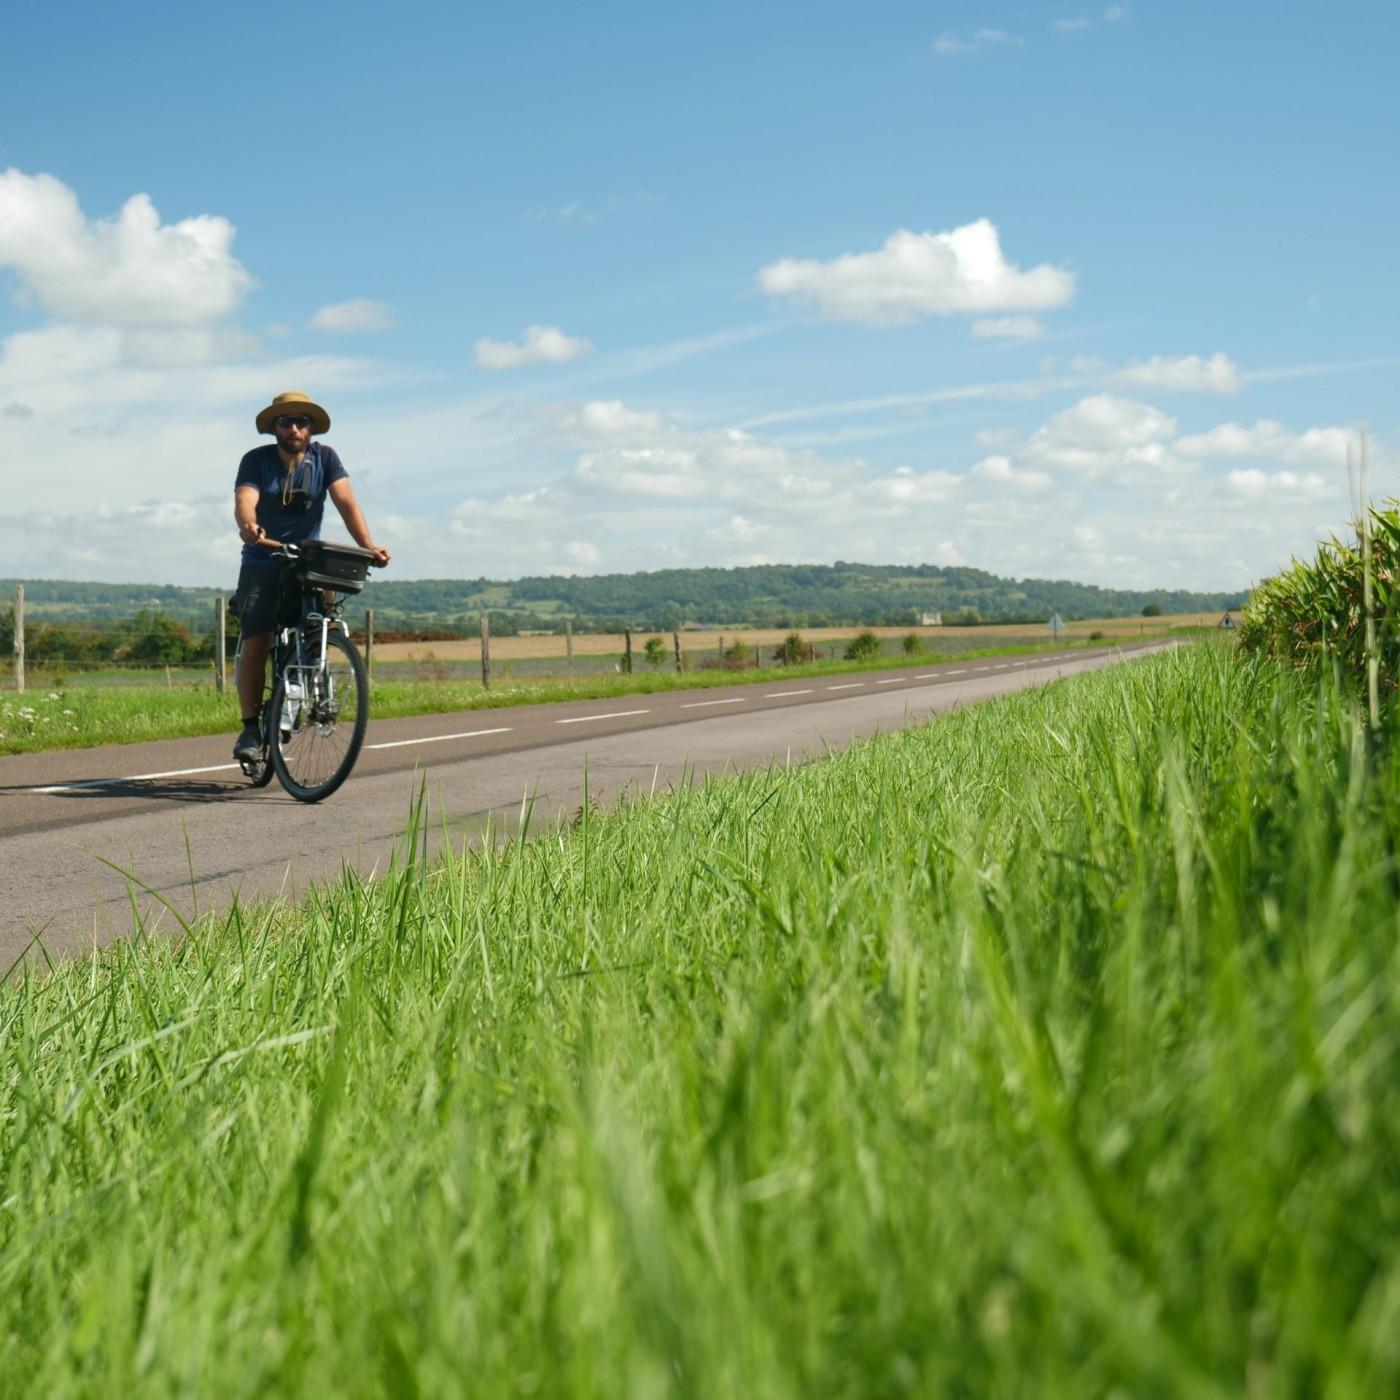 0404 - Globe Trotter - Tortuga : La France à vélo